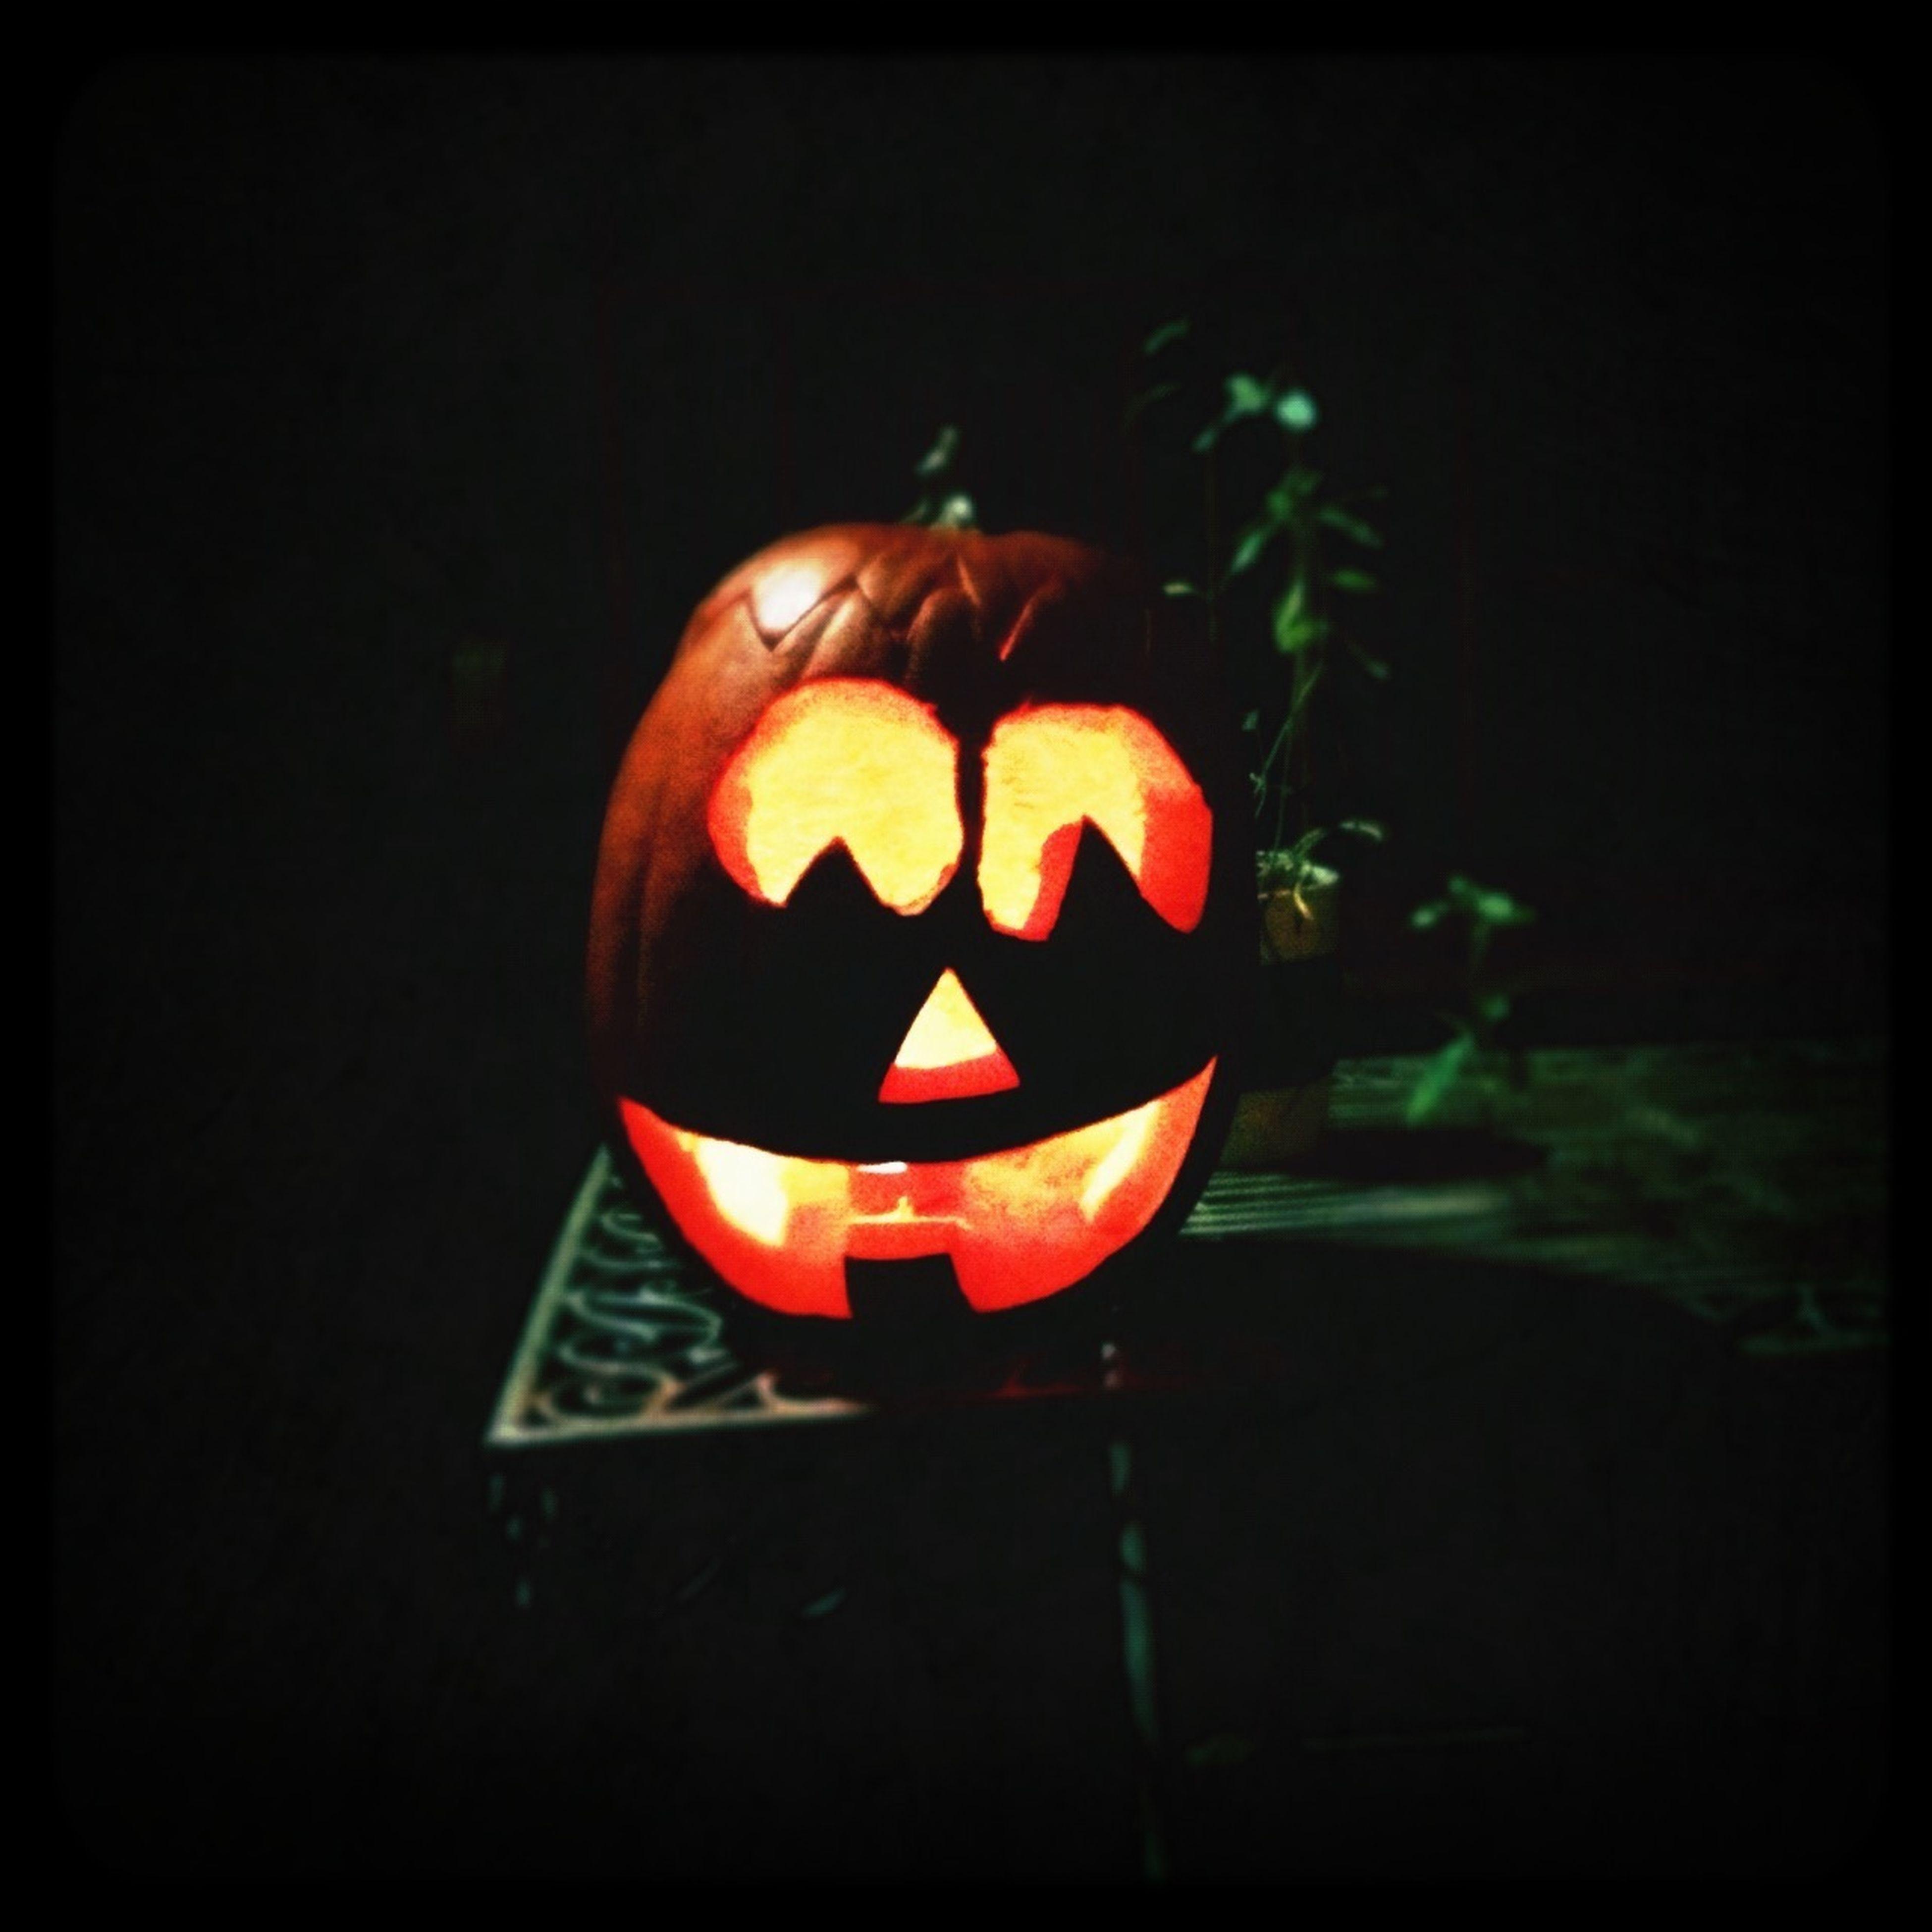 indoors, halloween, close-up, black background, red, flame, still life, celebration, illuminated, single object, anthropomorphic face, dark, pumpkin, art and craft, studio shot, human representation, burning, night, candle, creativity